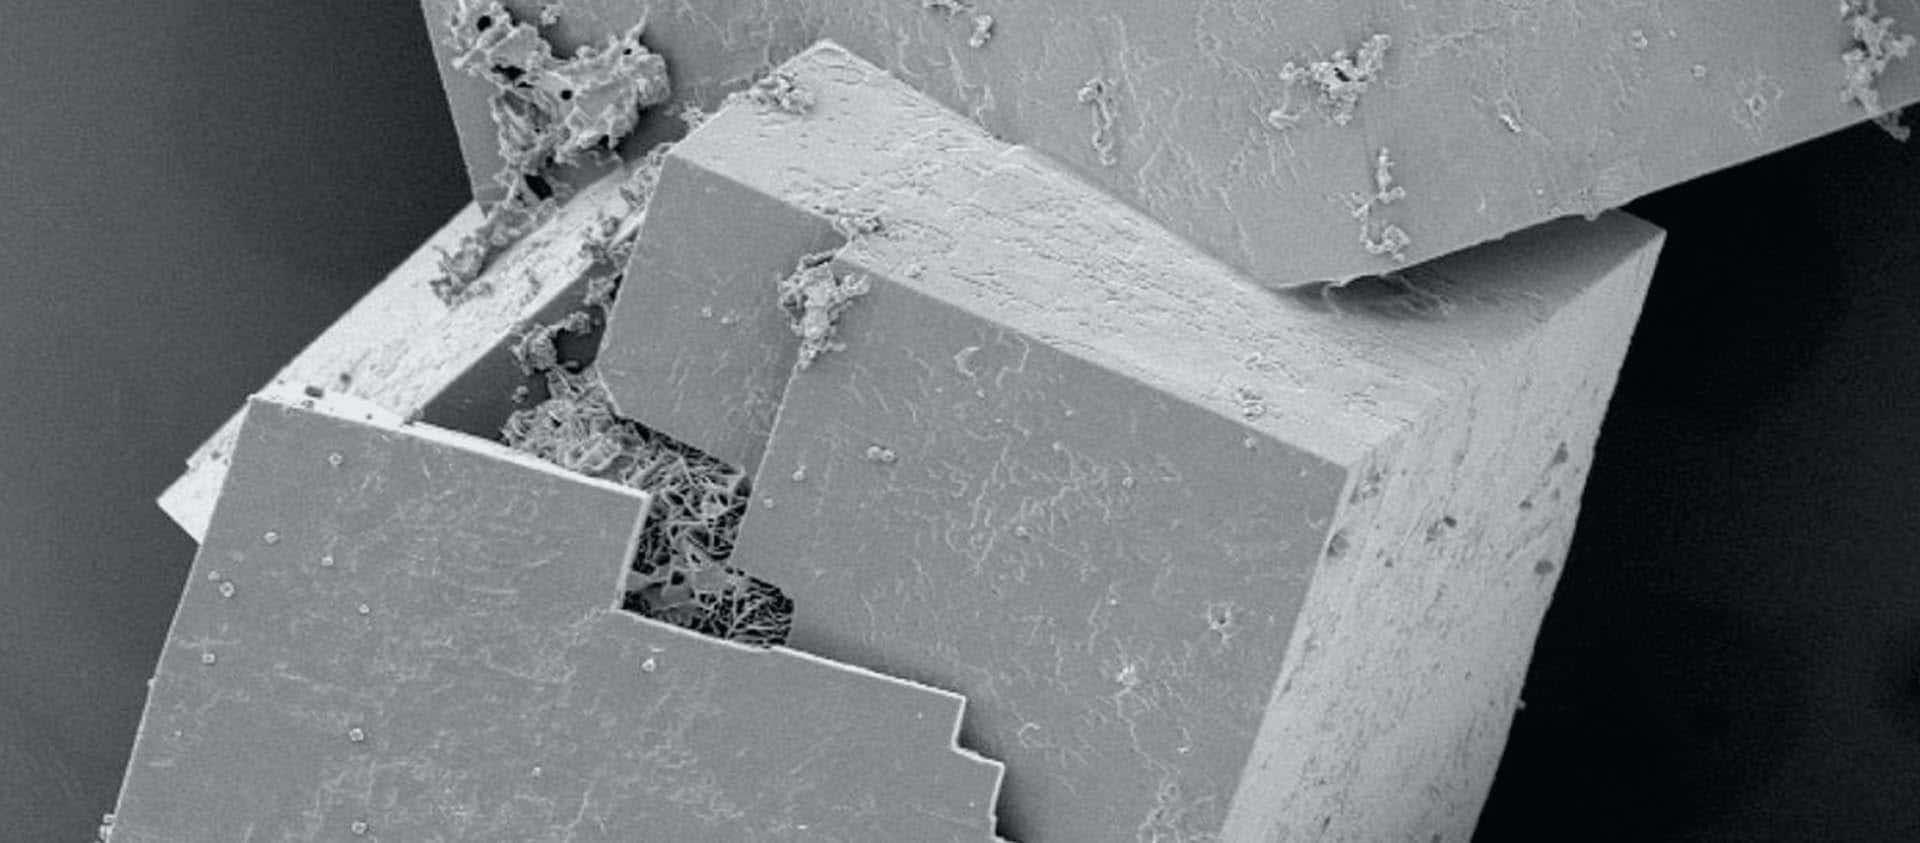 Nanotechnology Development